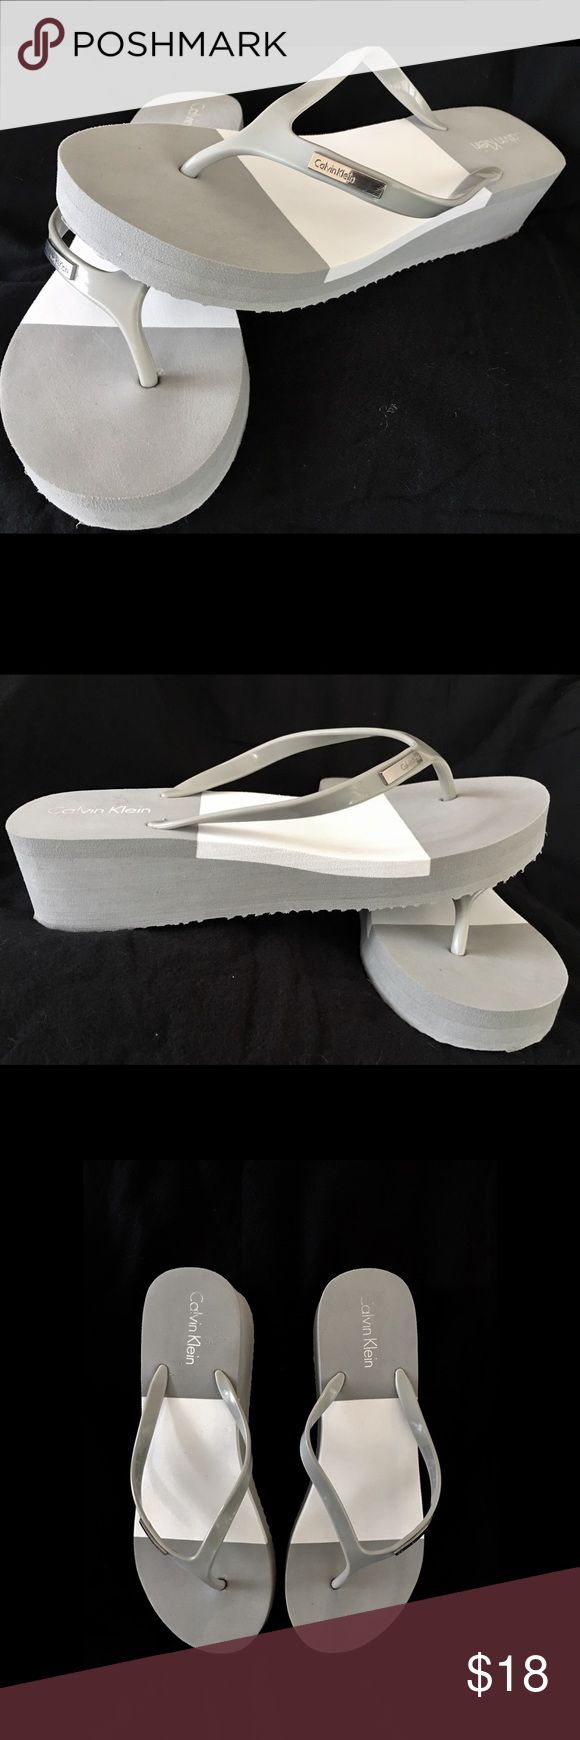 Selling this 🎀Nib Baden Eva By Calvin Klein Wedge Flip Flops🎀 on Poshmark! My username is: doone0703. #shopmycloset #poshmark #fashion #shopping #style #forsale #Calvin Klein #Shoes